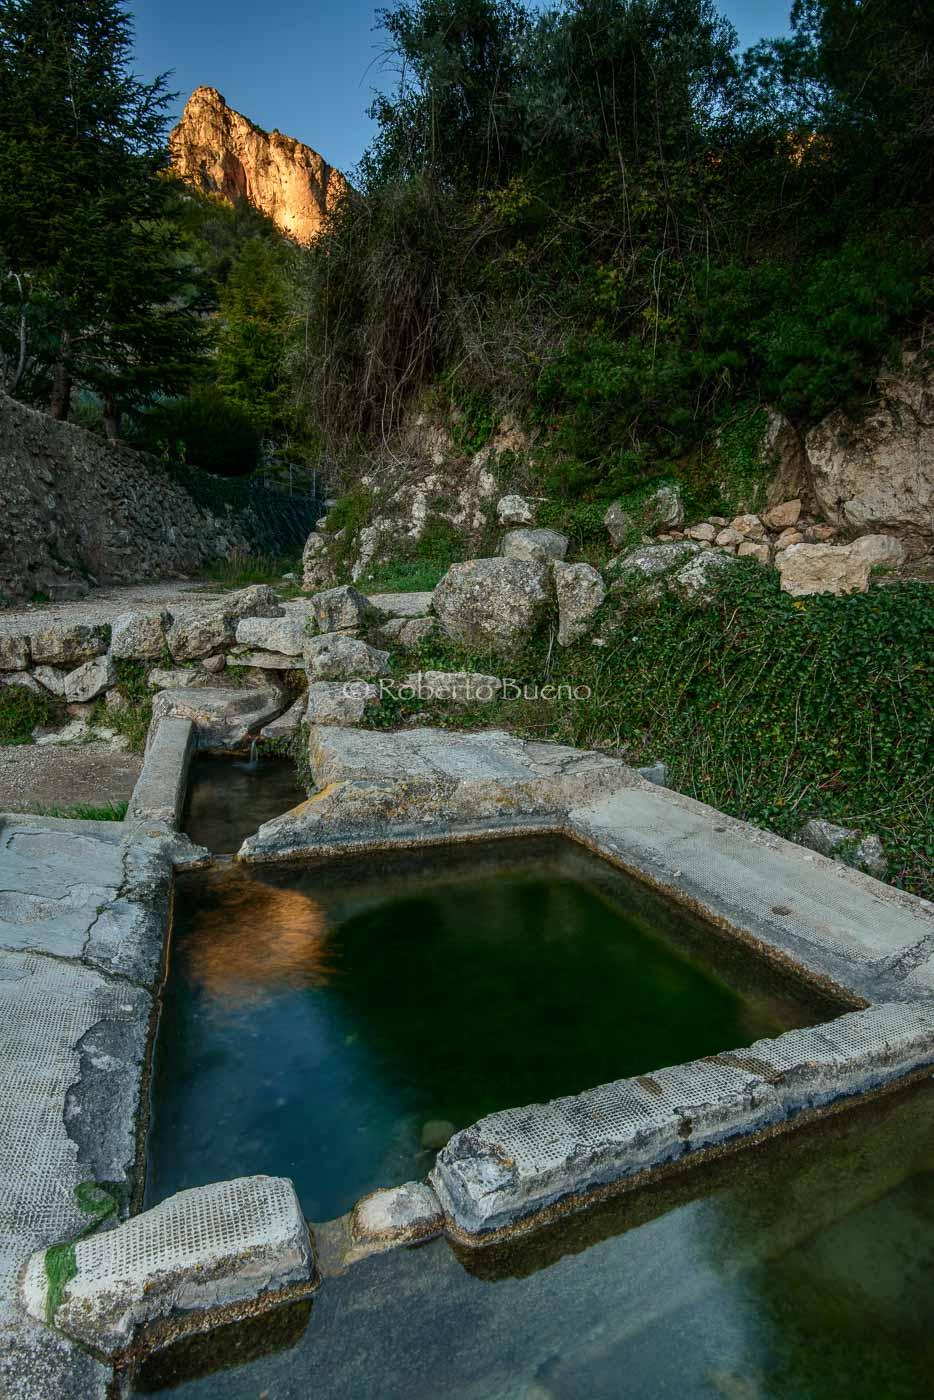 Lavadero de Remullá - Washing place. Remullá - L´Hospitalet de l´Infant - Vandellòs, Tarragona, Spain, Roberto Bueno; Photography